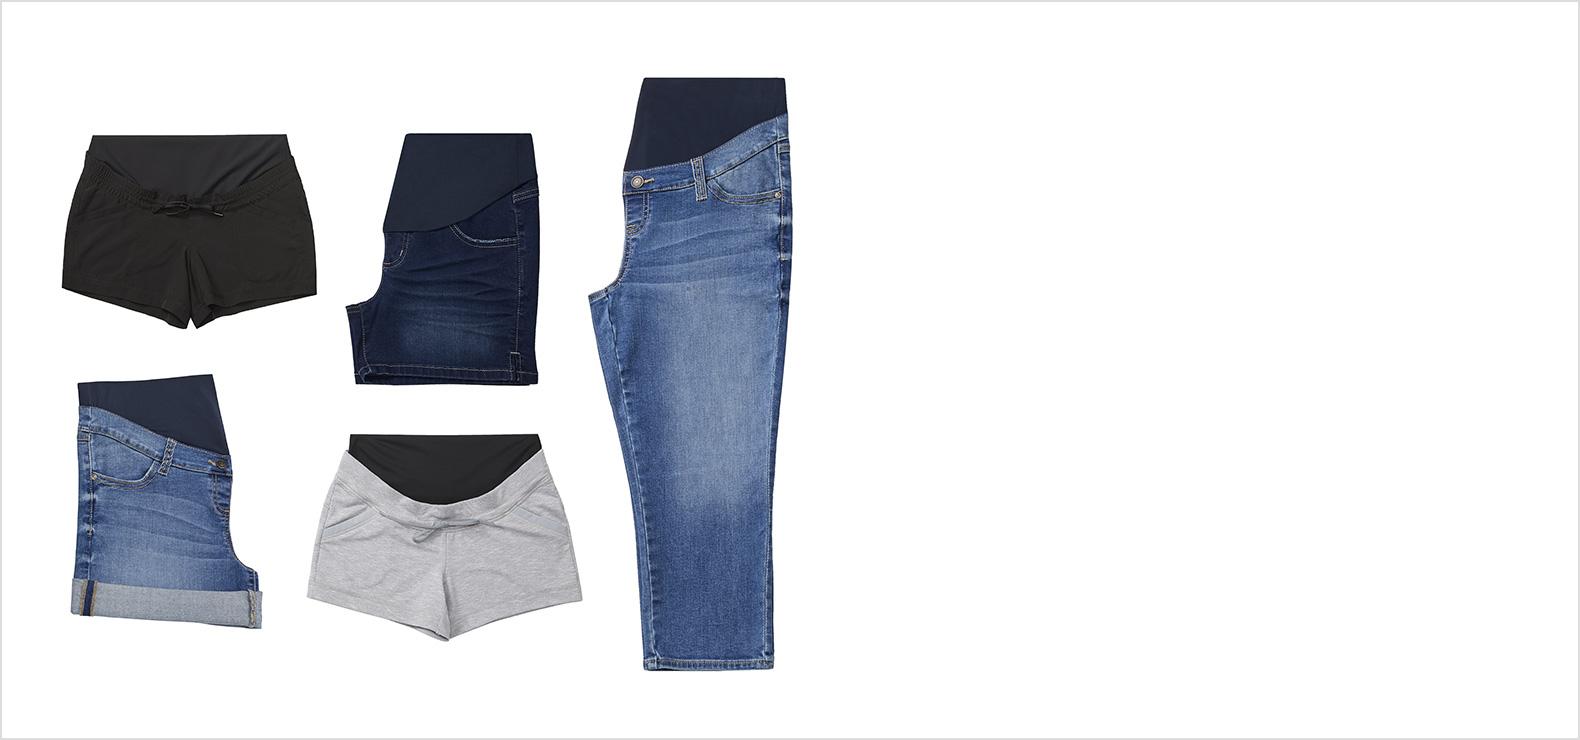 maternity Clothing - Capris & Shorts